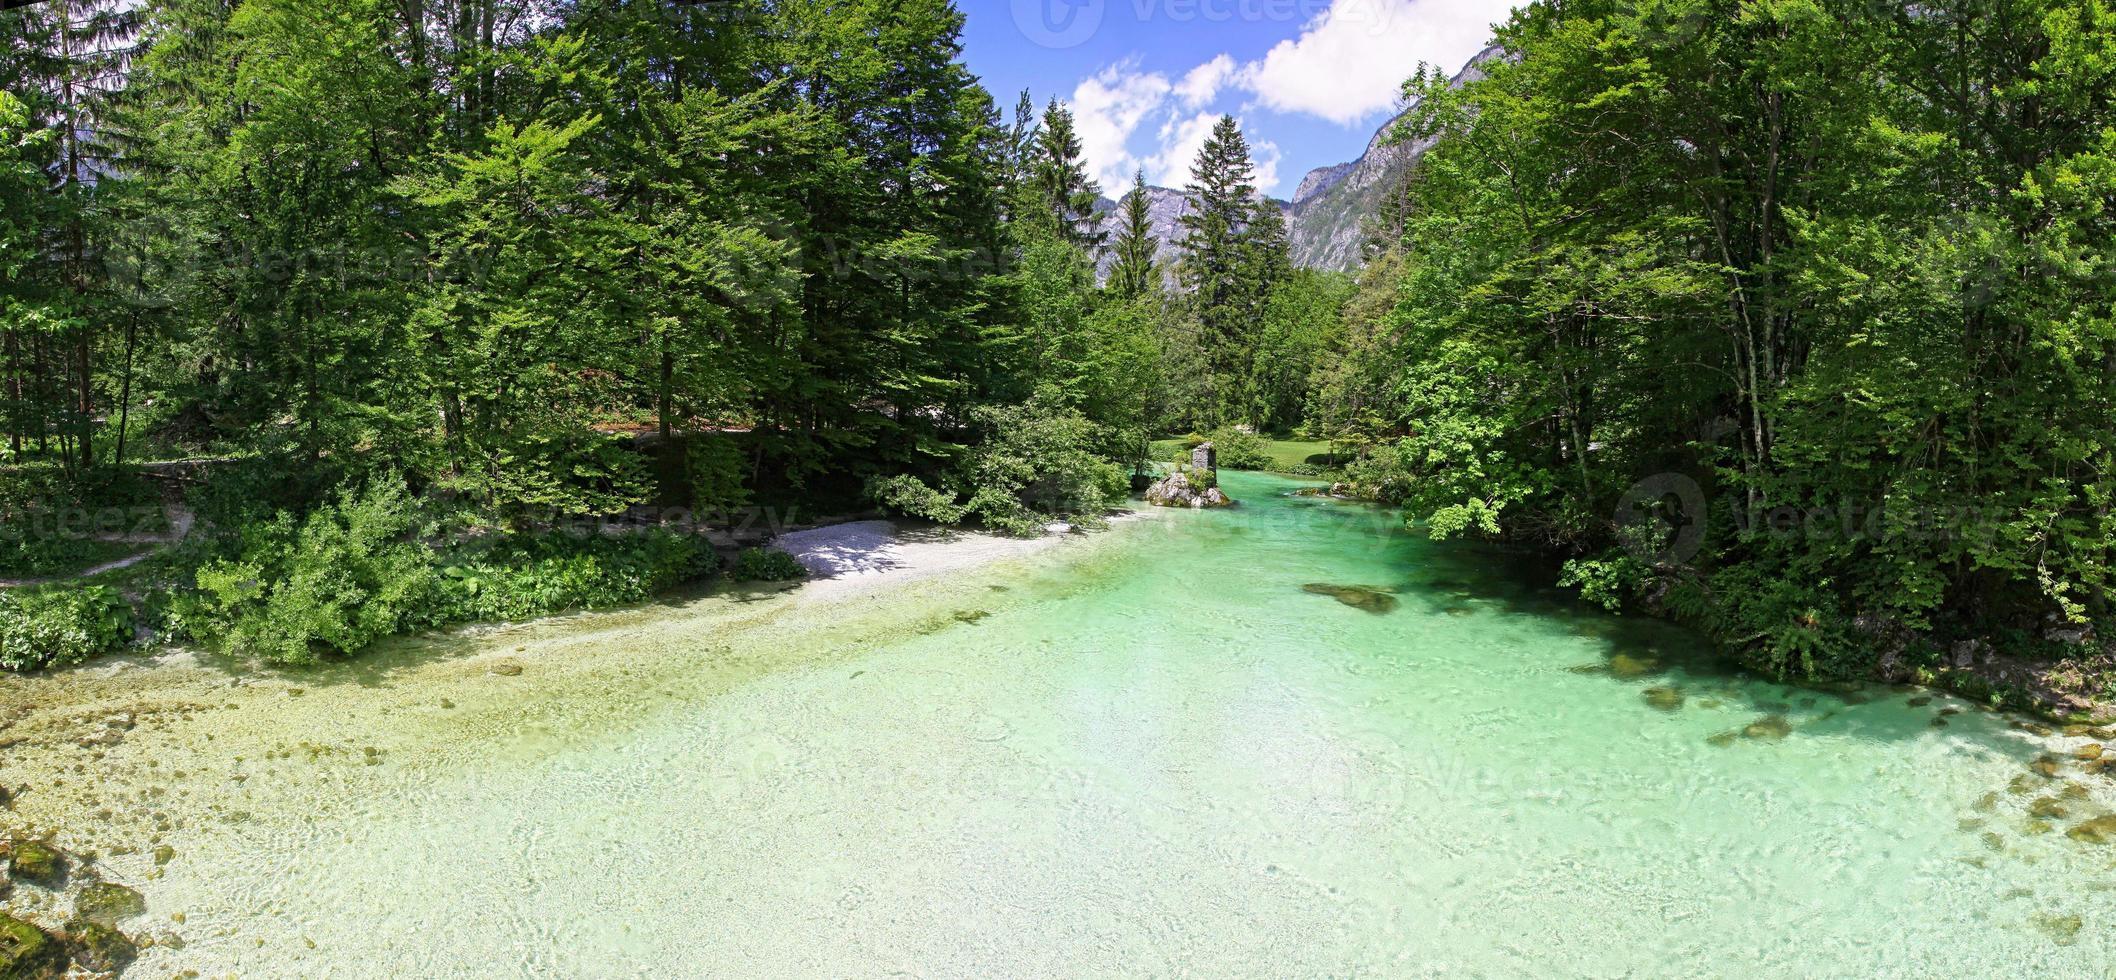 Sava Bohinjka River dans les Alpes juliennes, Slovénie photo